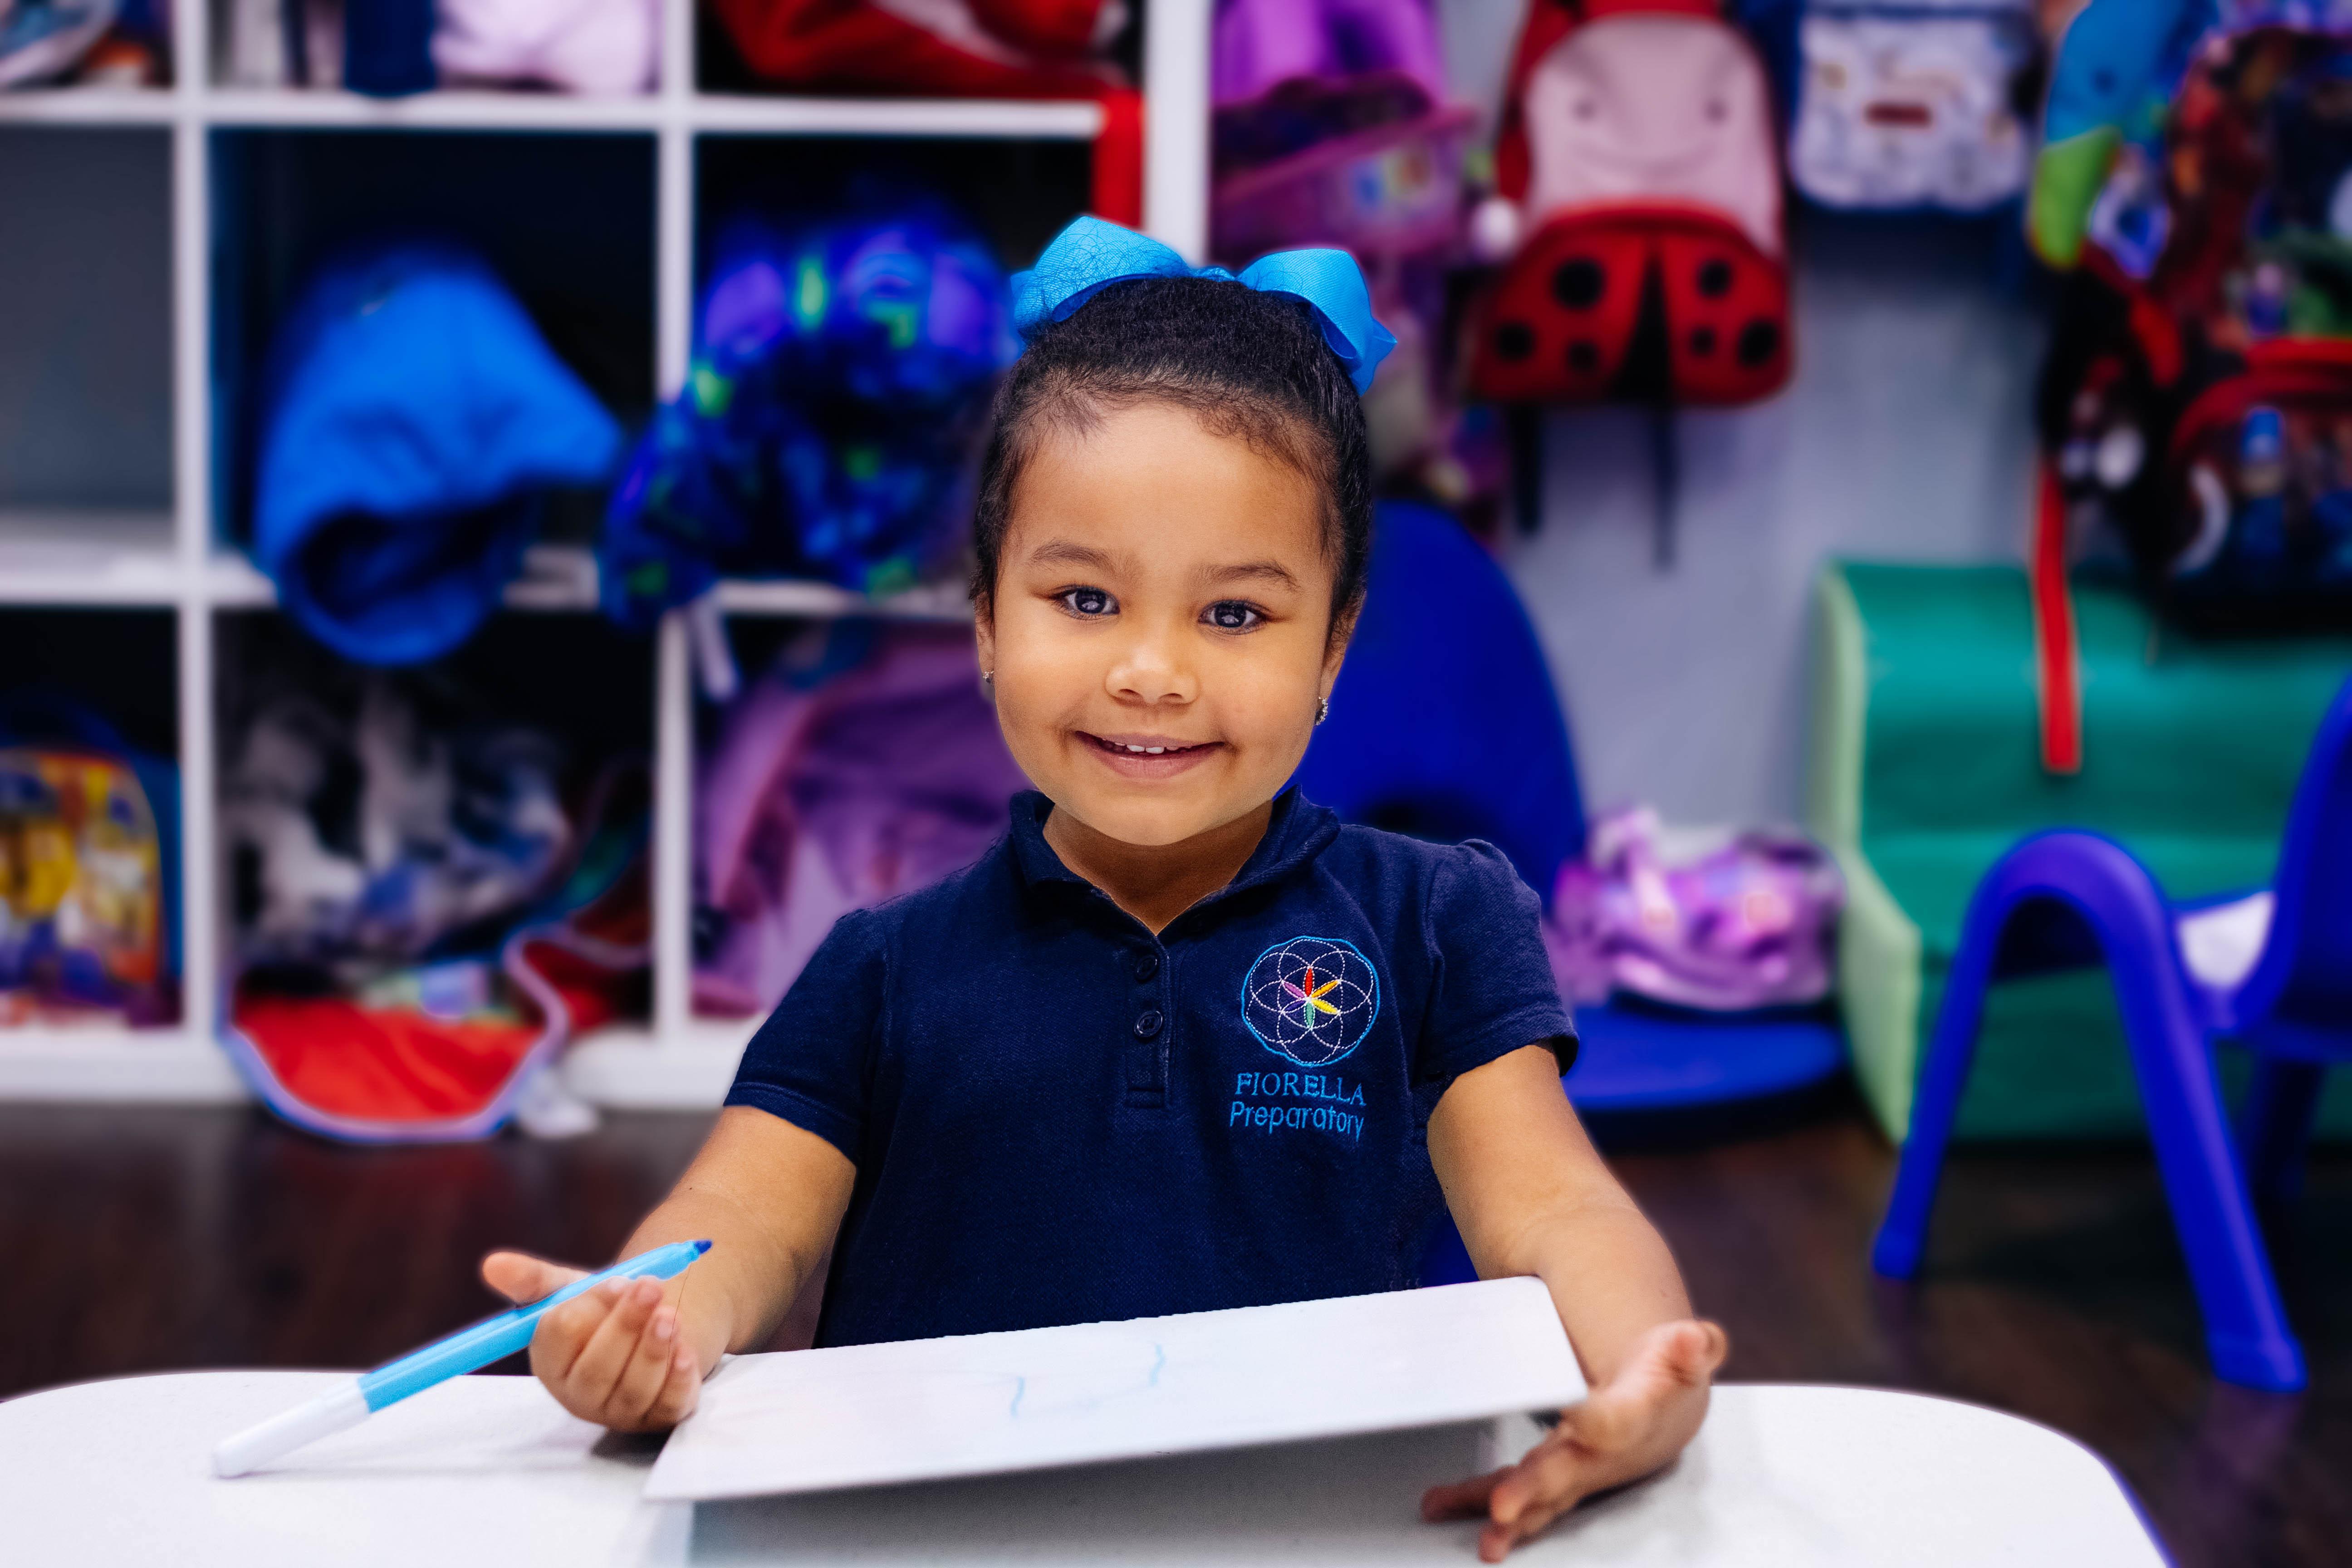 Preschool girl smiling and holding marker-2